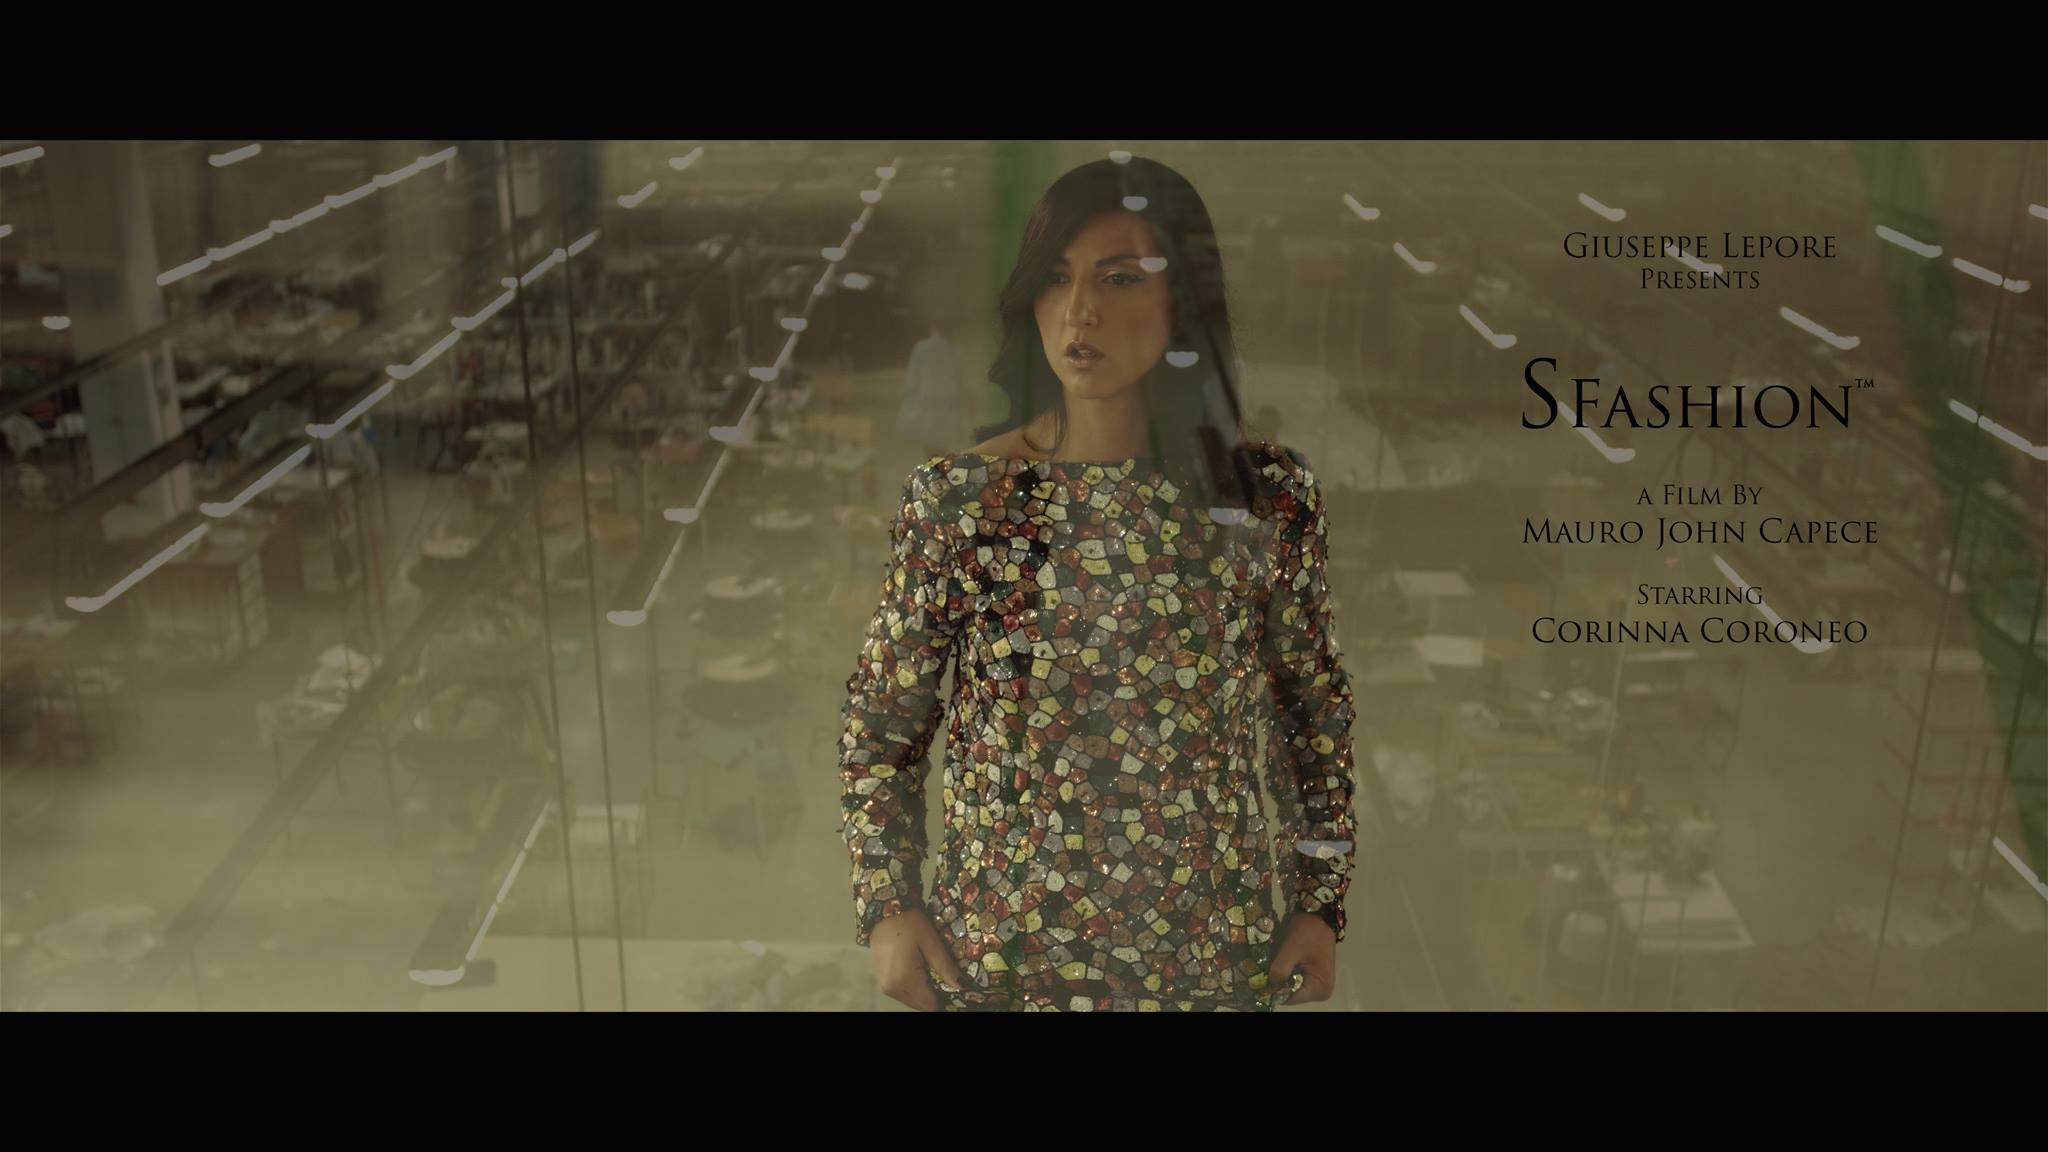 SFashion al Montreal Film Festival 2016